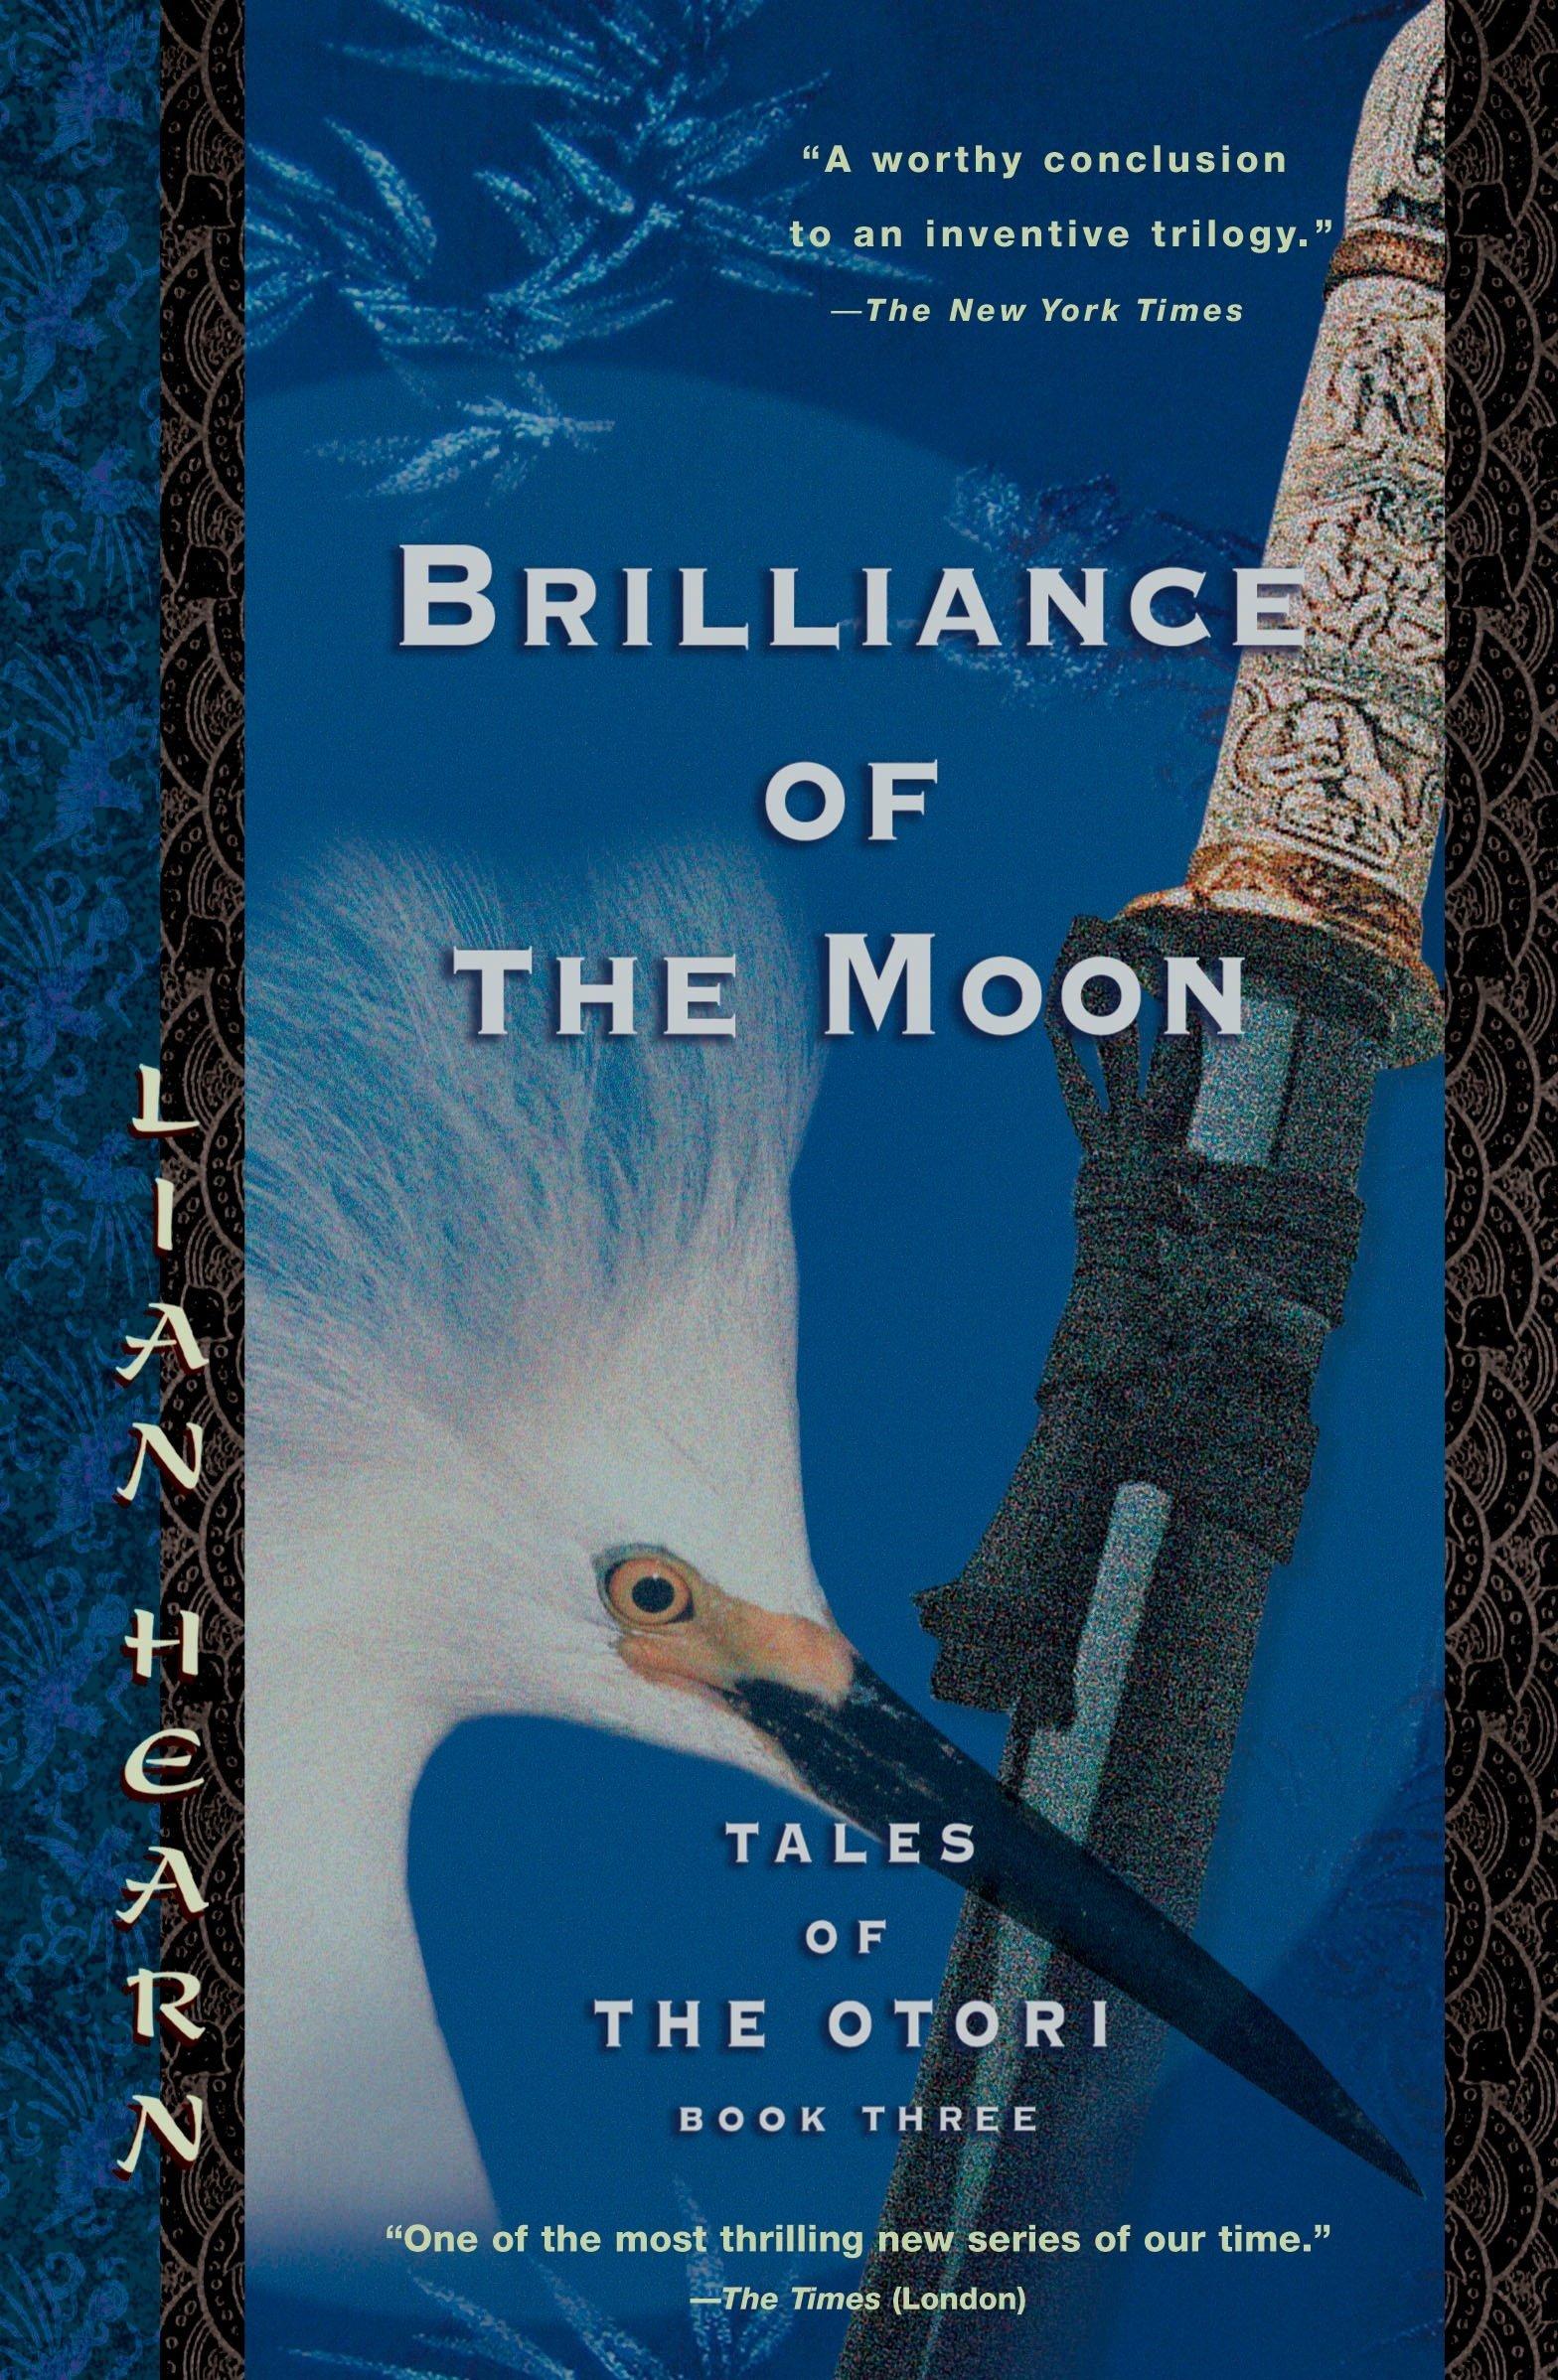 Amazon Com Brilliance Of The Moon Tales Of The Otori Book Three 9781594480867 Hearn Lian Books